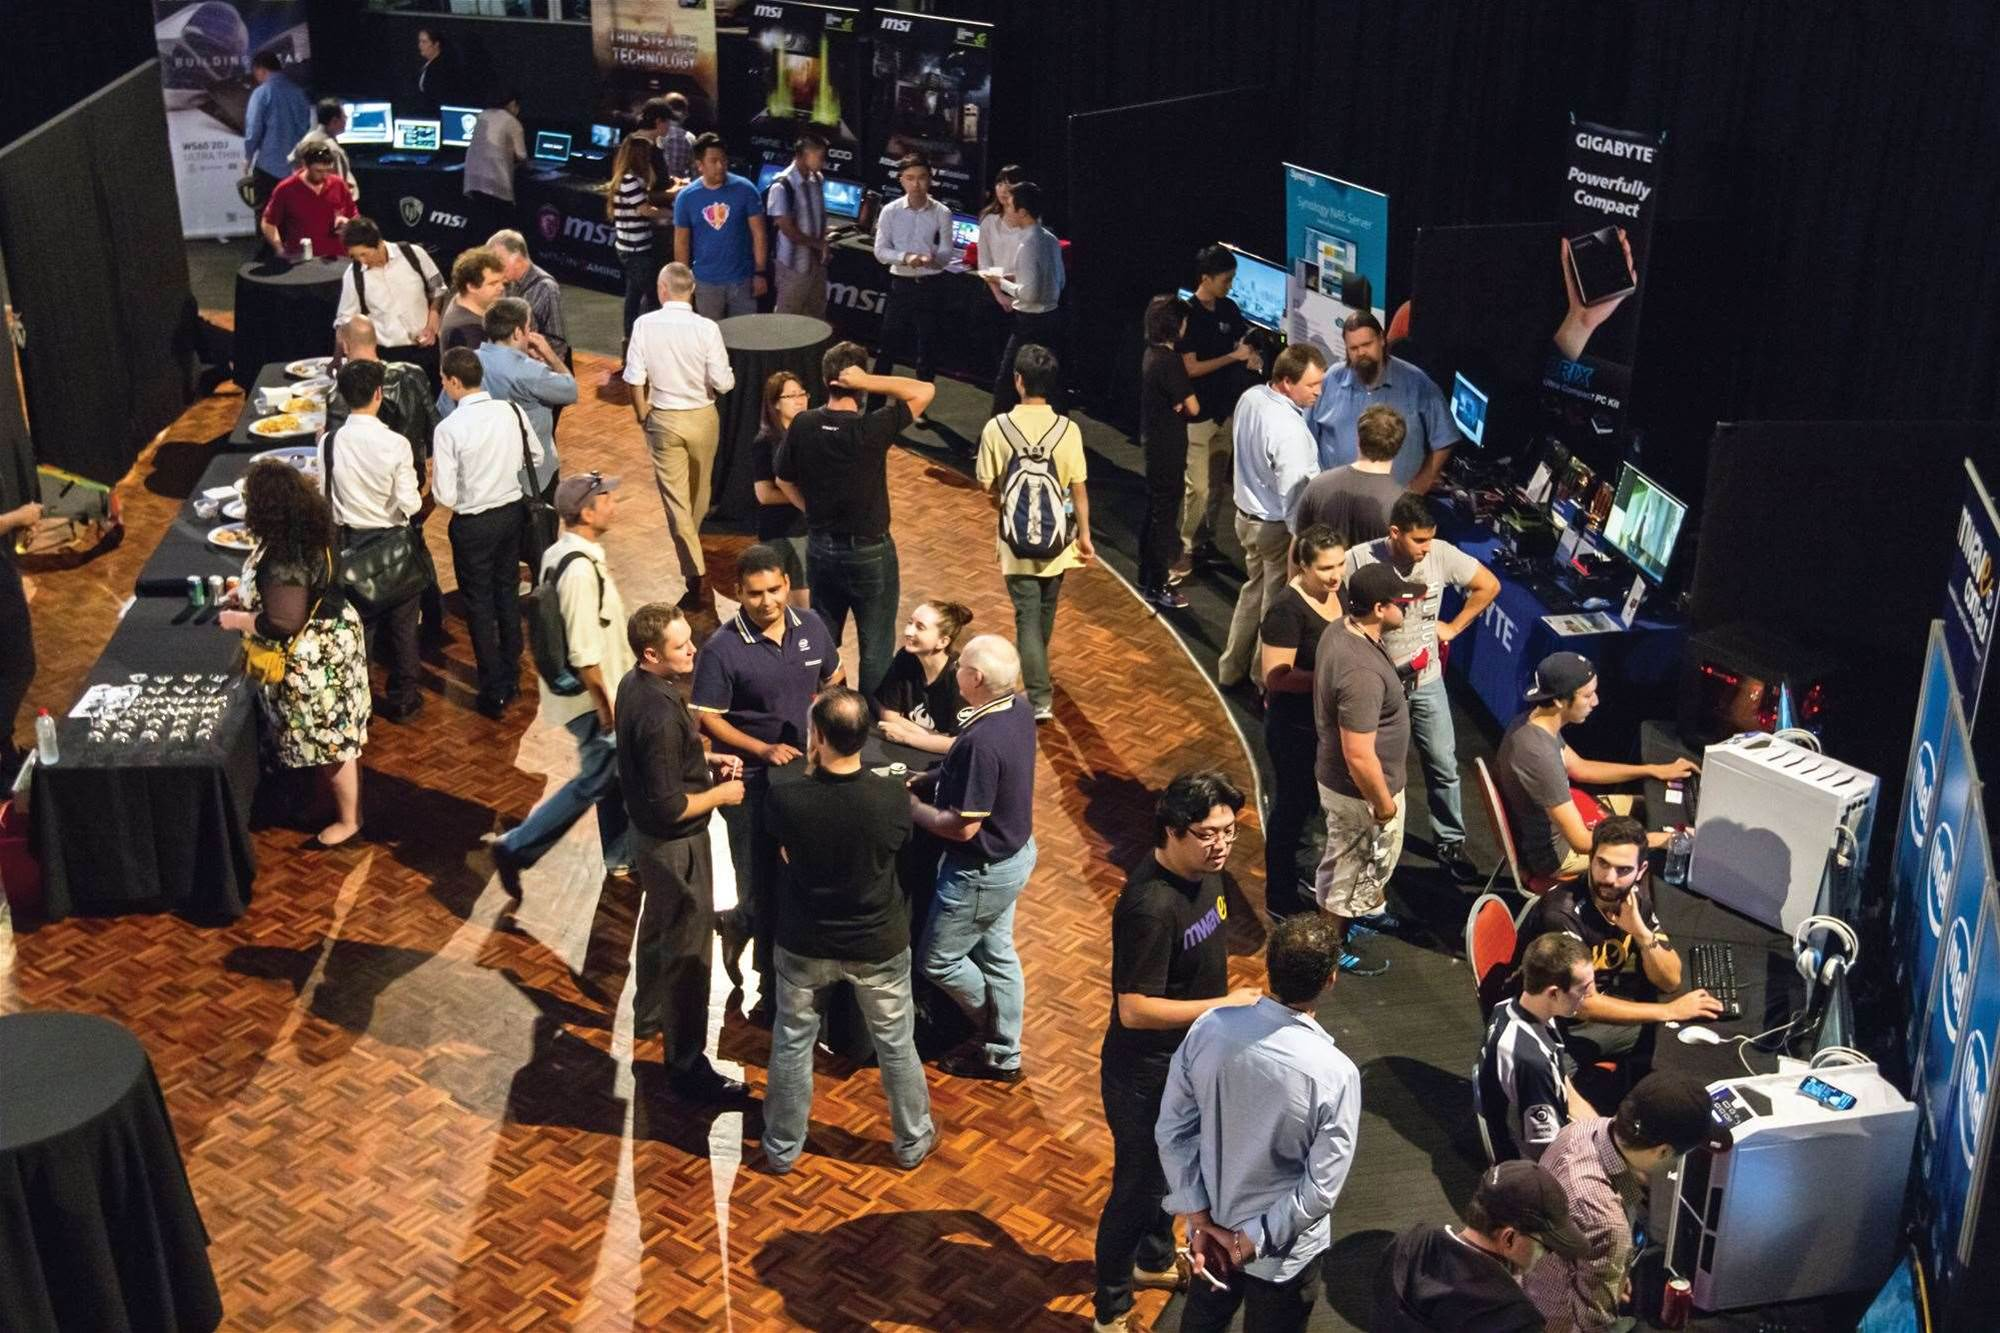 UPGRADE AUSTRALIA 4.0 IS COMING TO SYDNEY!